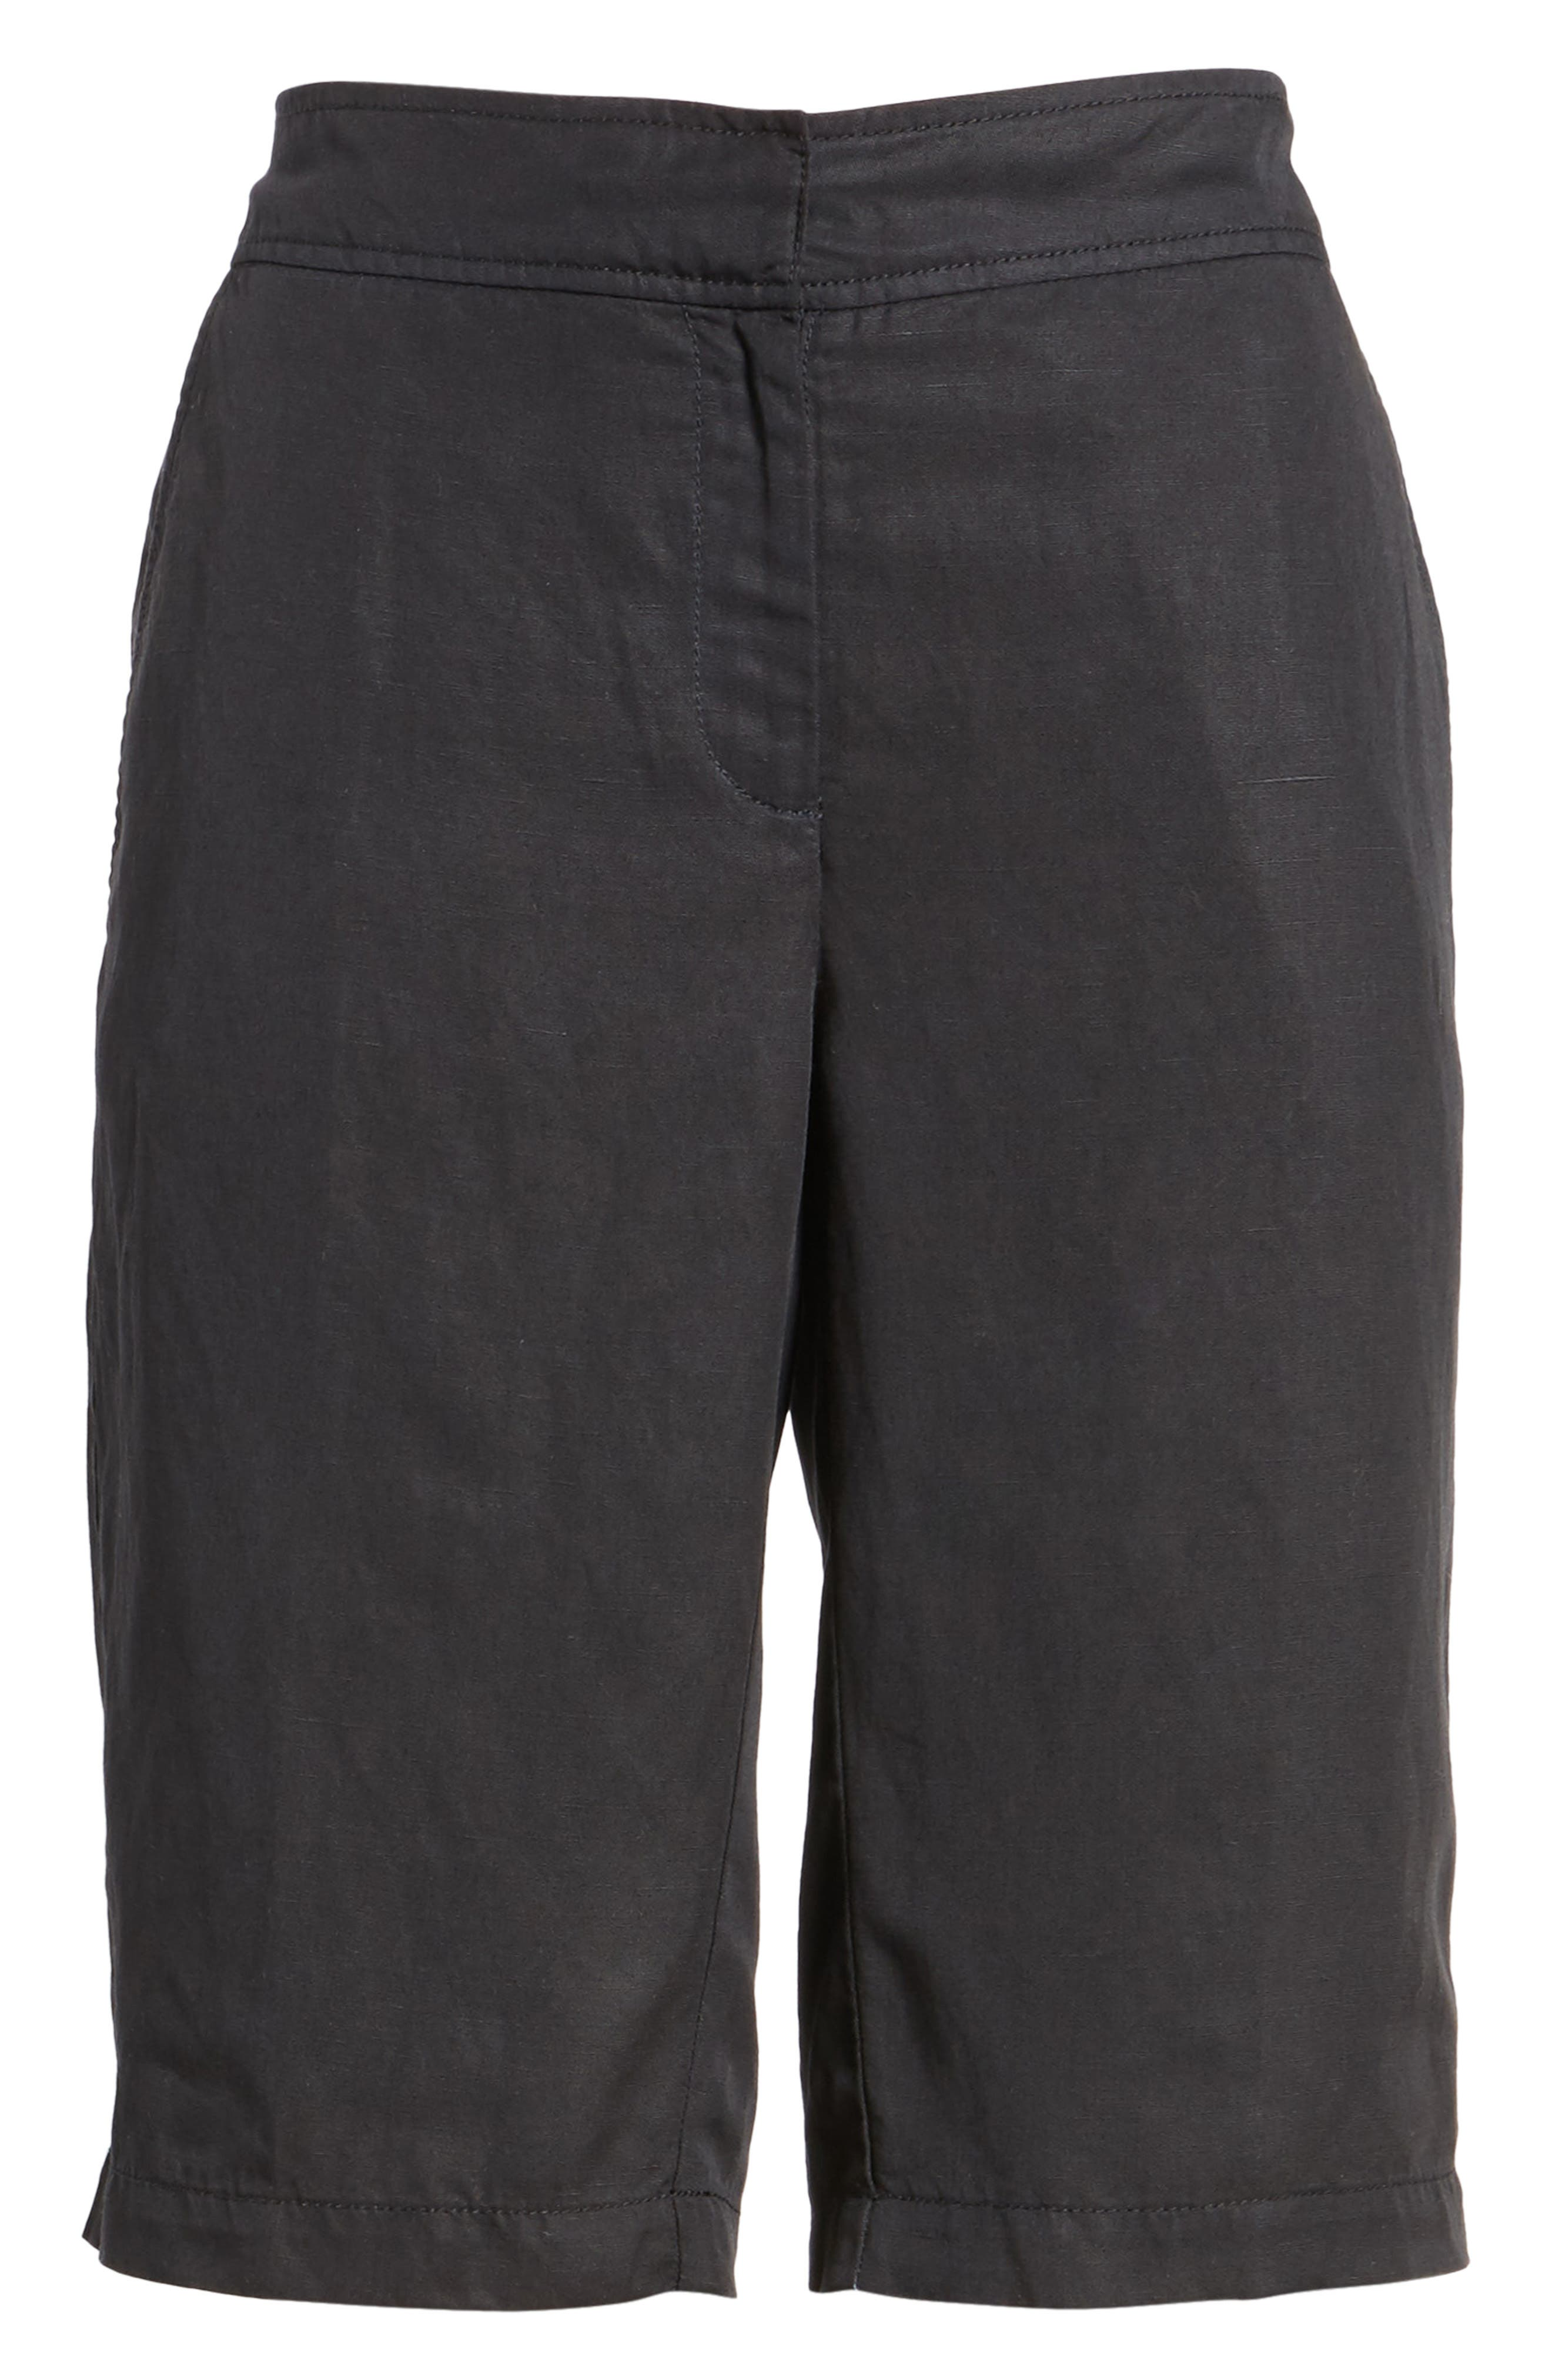 Tencel<sup>®</sup> Lyocell & Linen Walking Shorts,                             Main thumbnail 1, color,                             Black